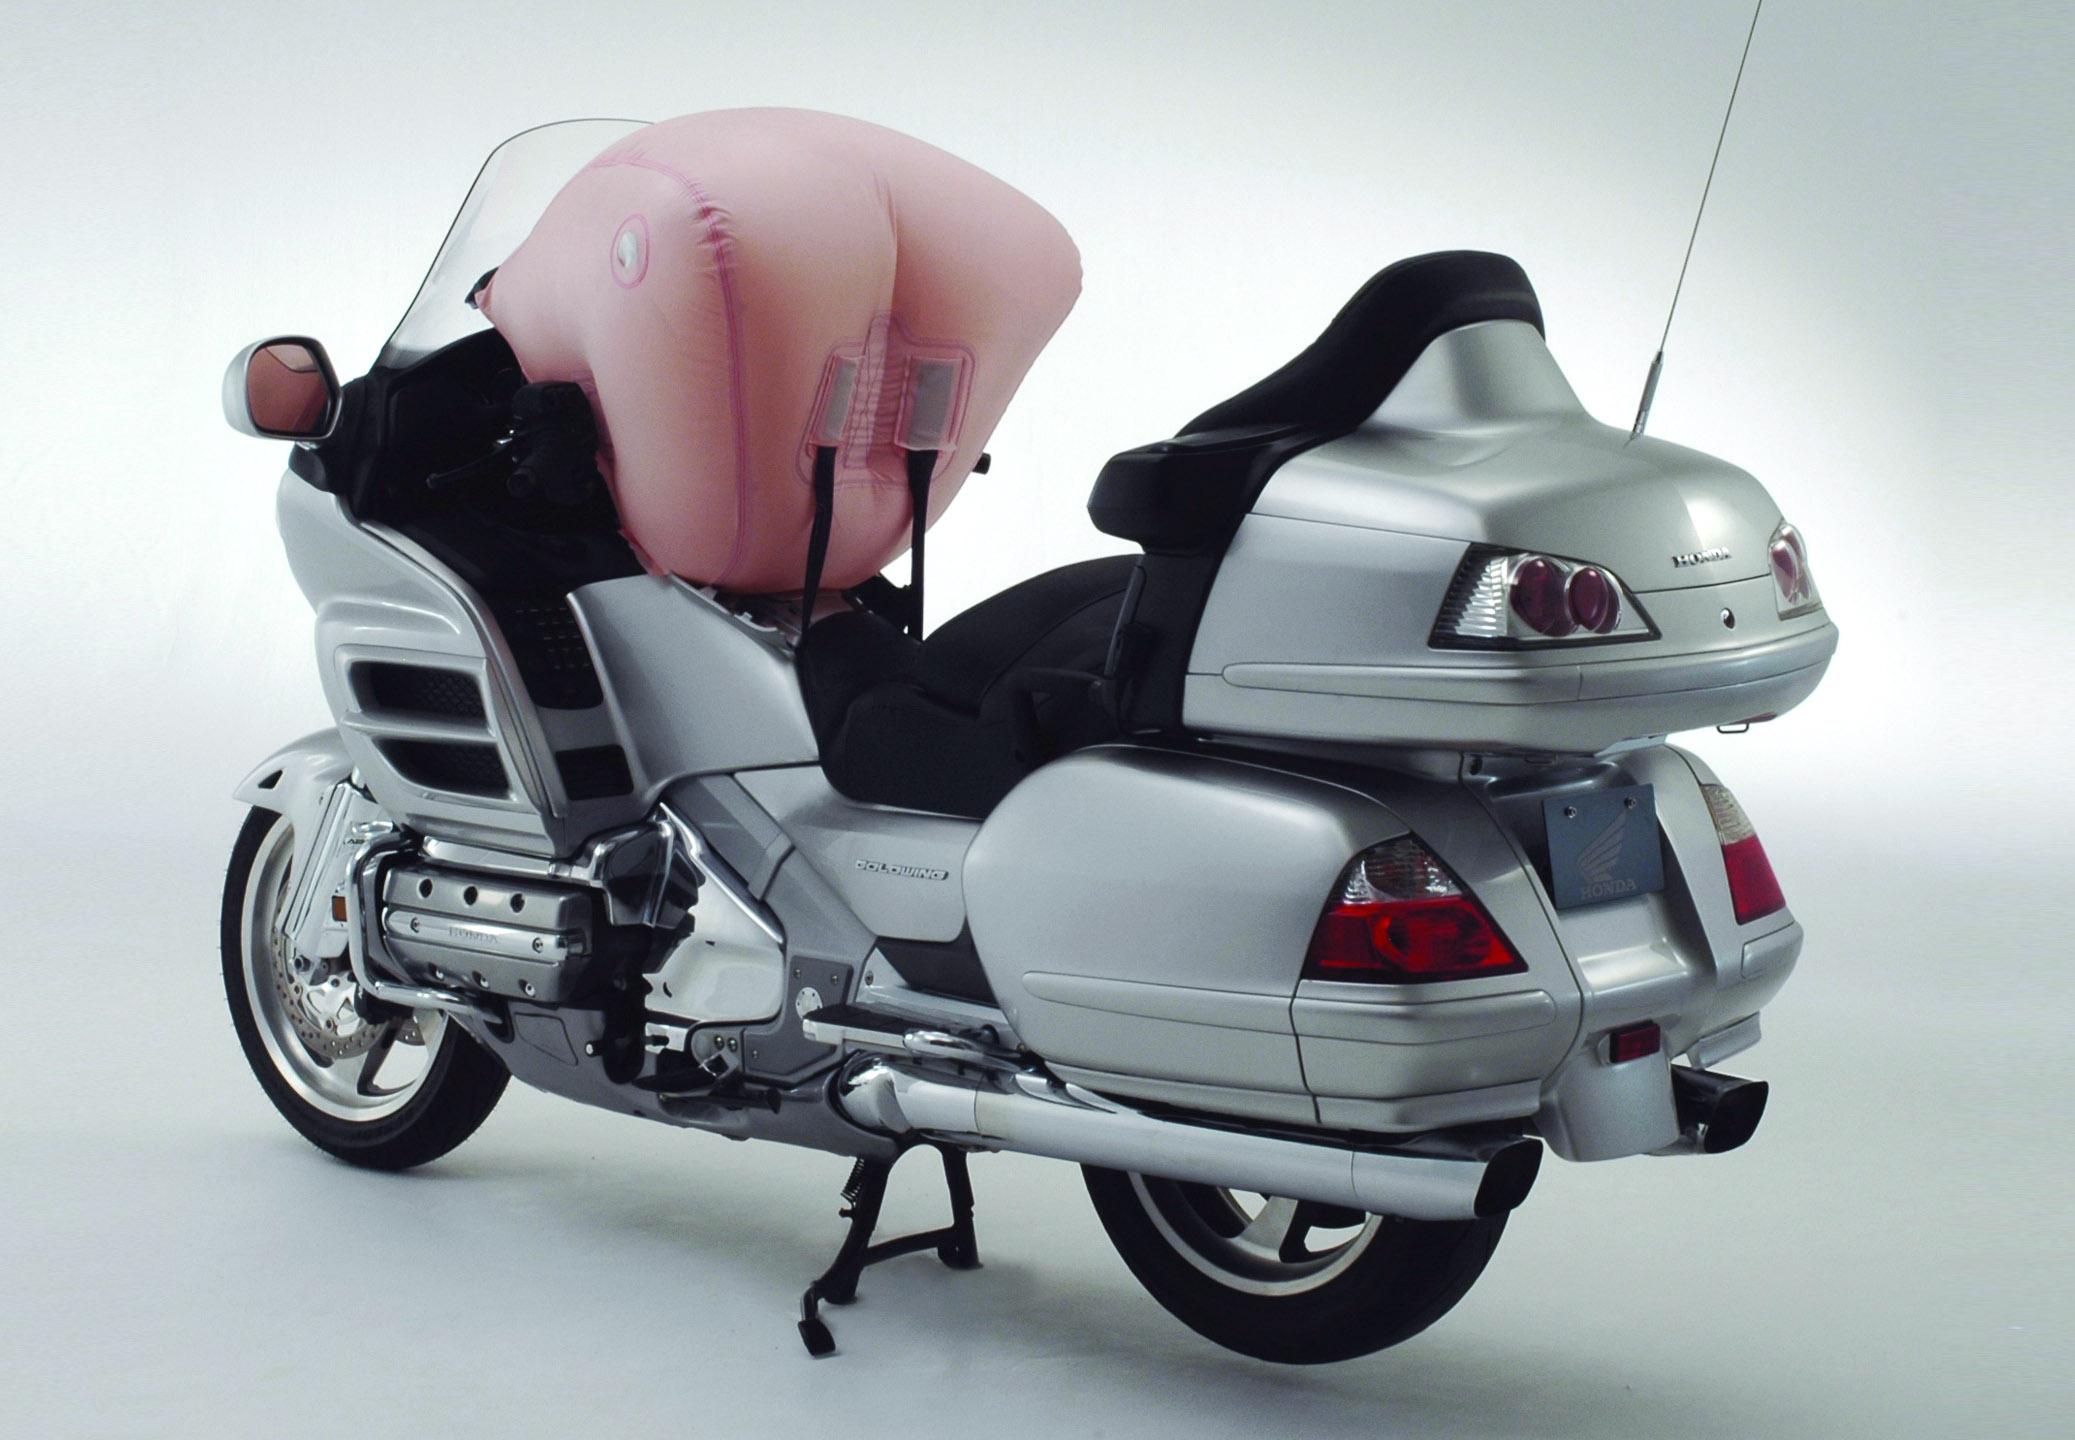 honda goldwing 1800 la moto qui r alise un miracle dynamique. Black Bedroom Furniture Sets. Home Design Ideas